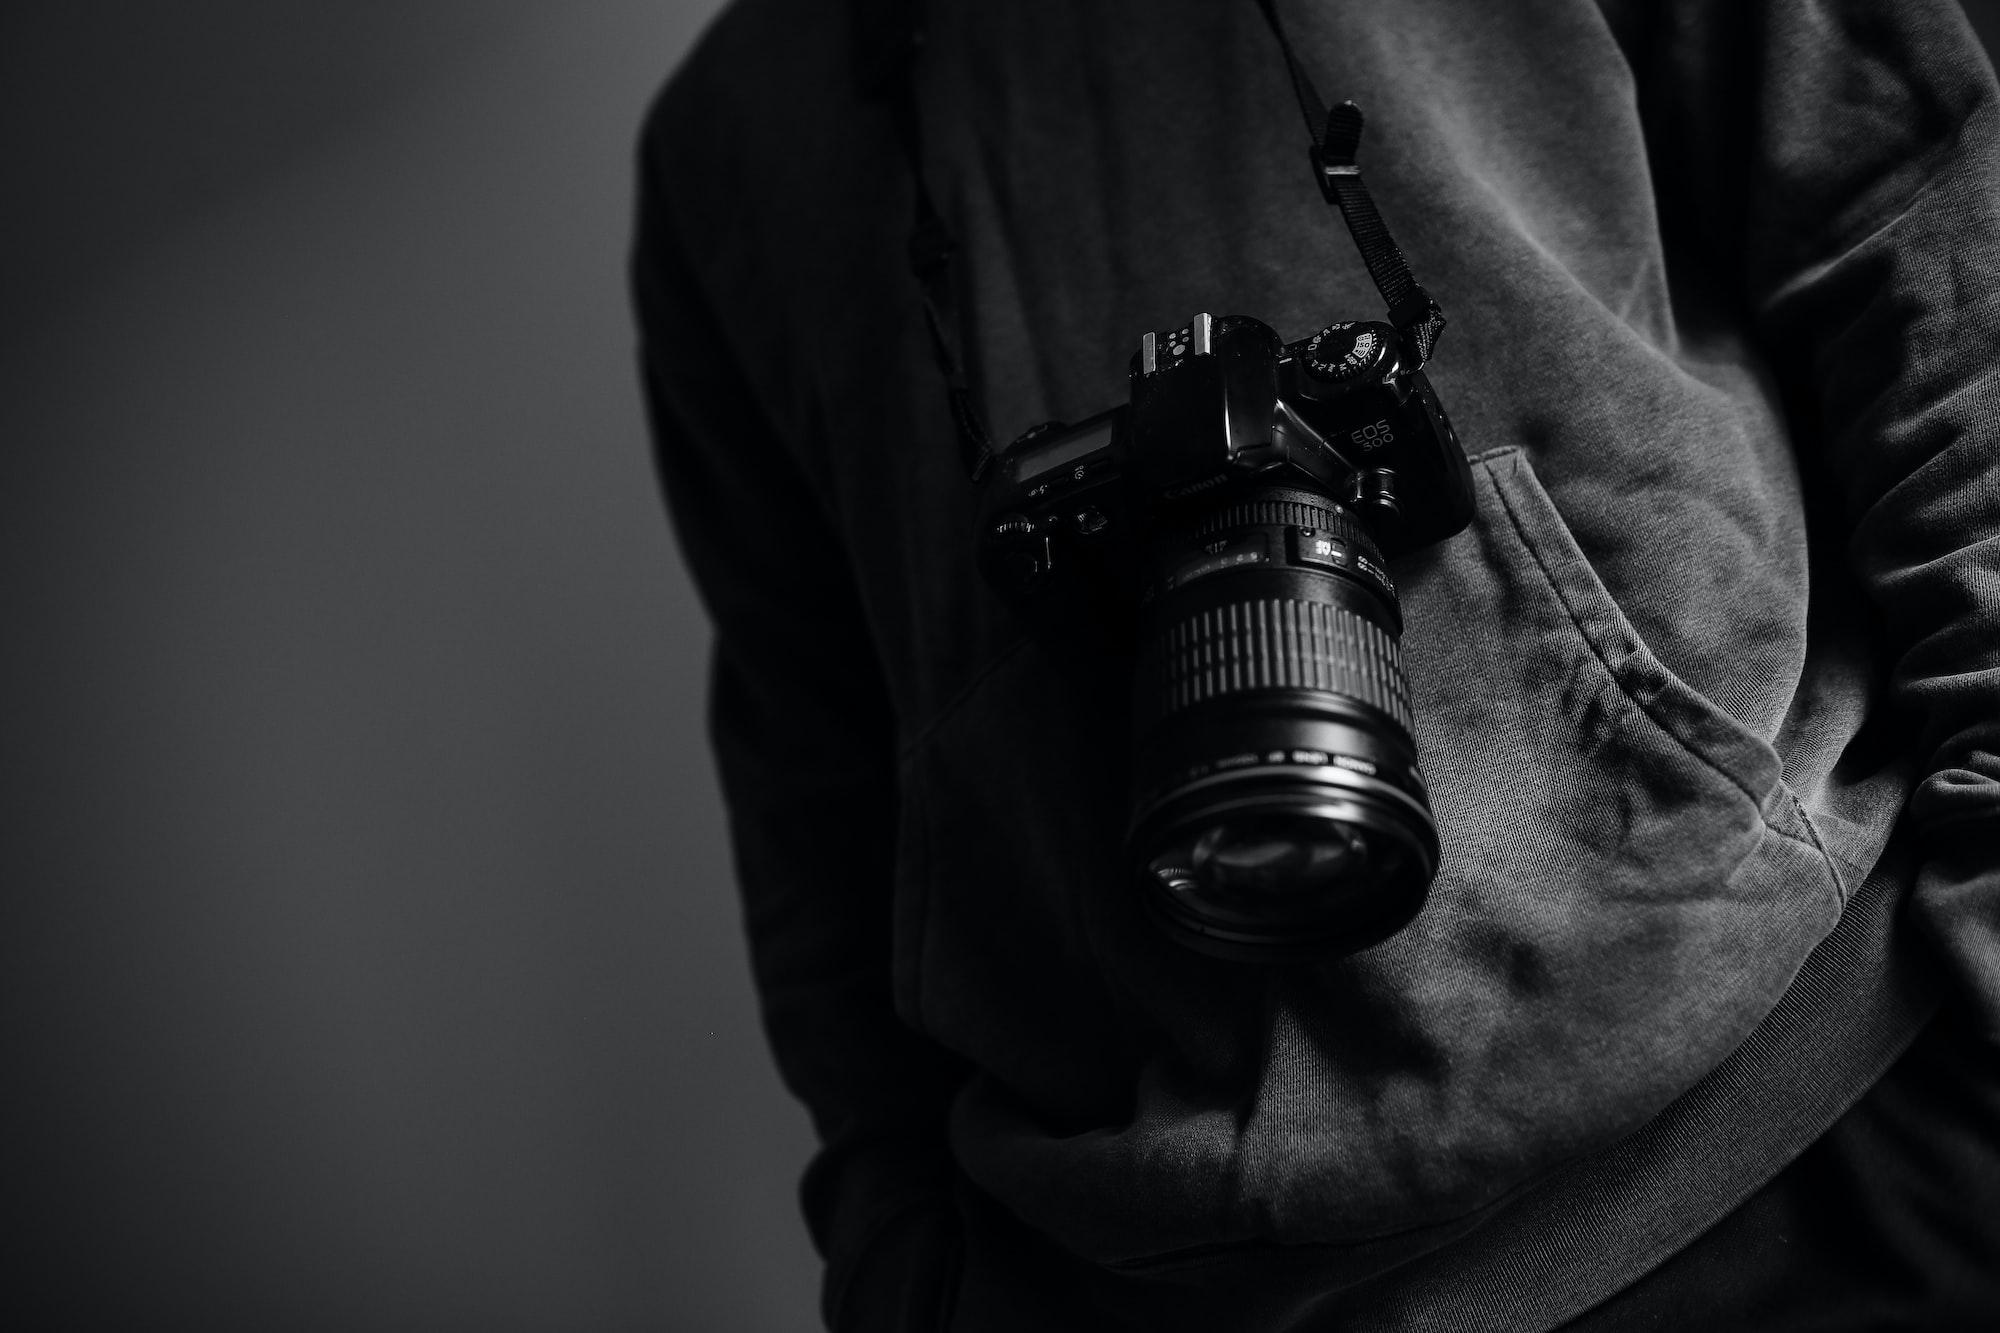 monochrome camera and hoody